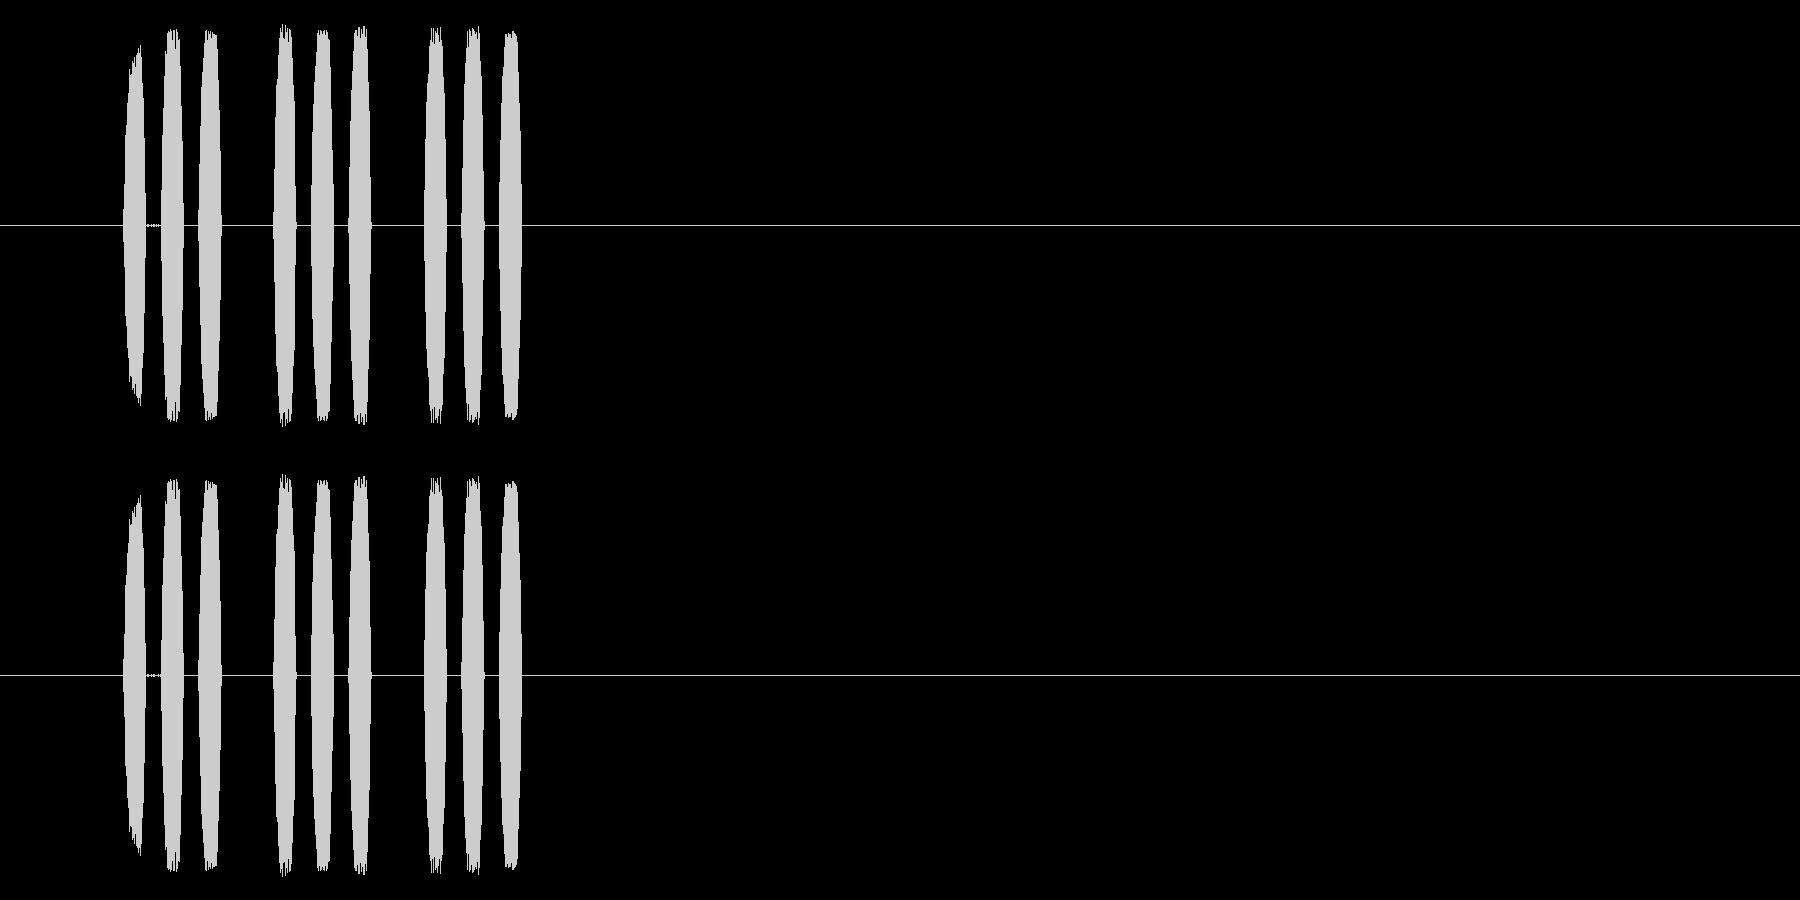 SNES-RPG04-16(魔法 状態)の未再生の波形